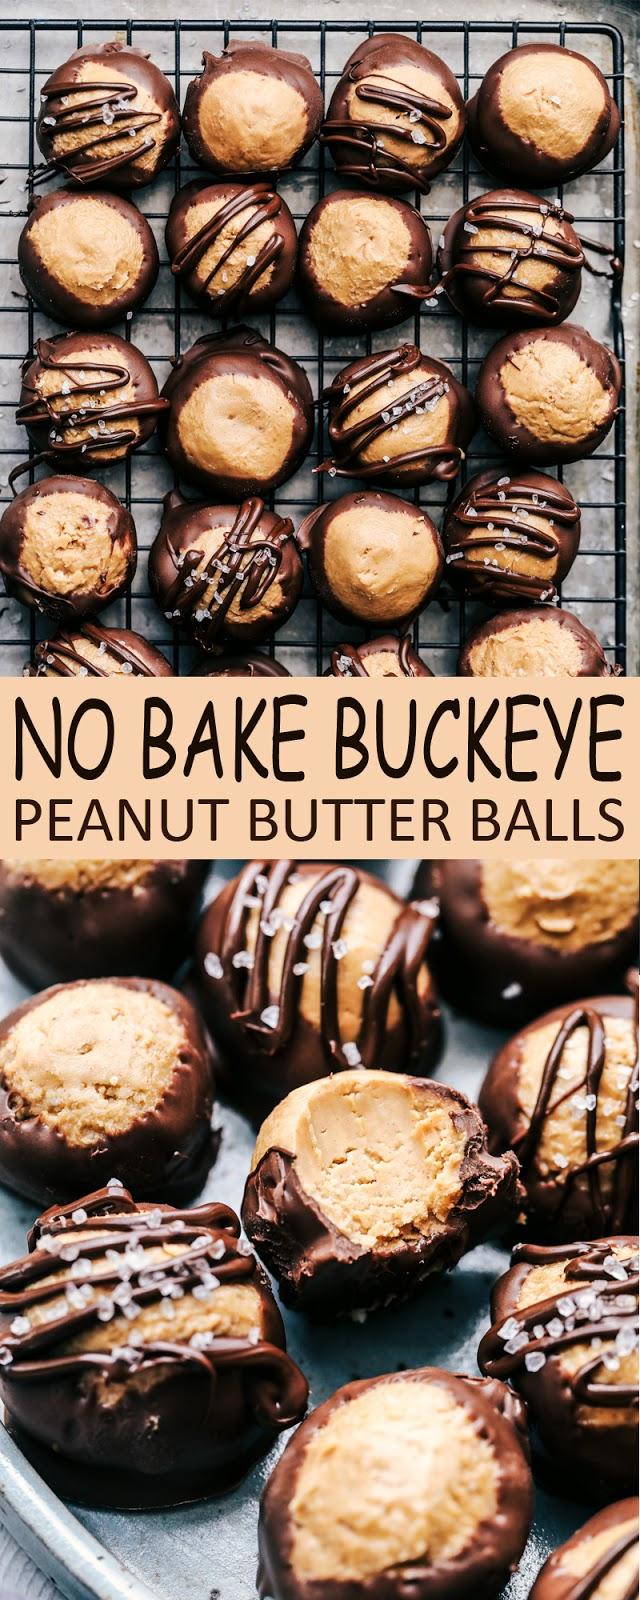 NO BAKE BUCKEYE PEANUT BUTTER BALLS